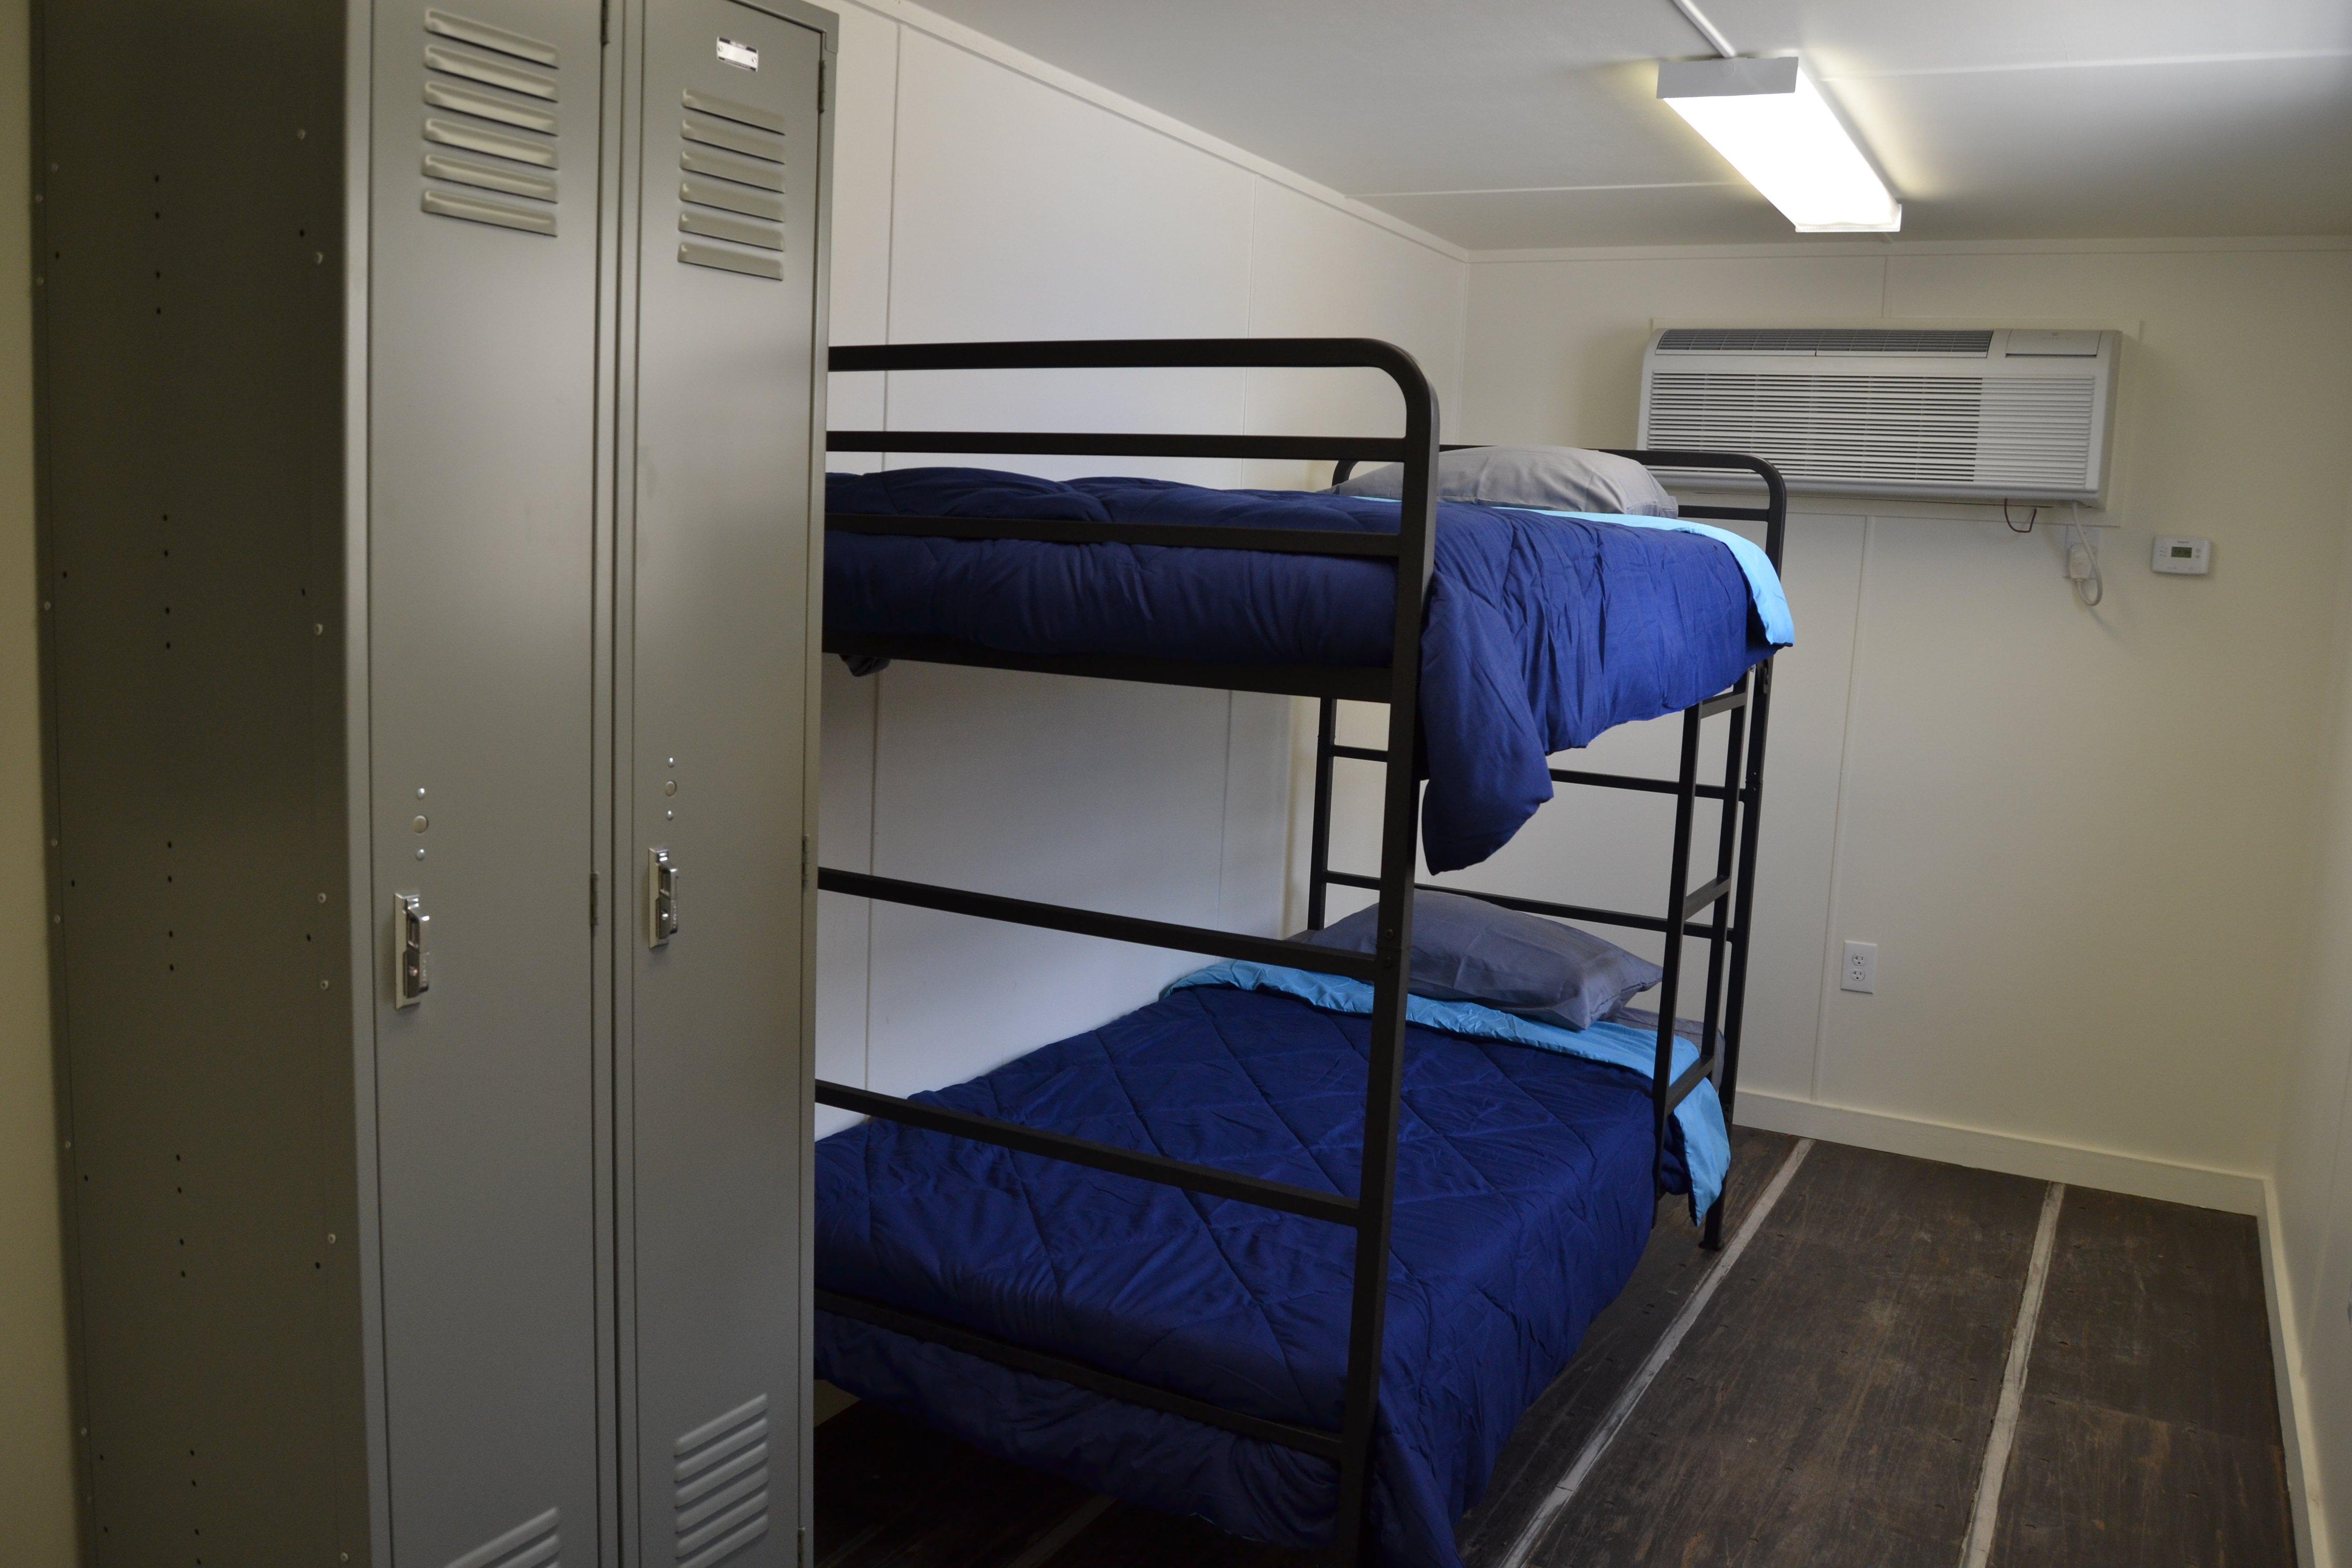 conex-housing-bedroom